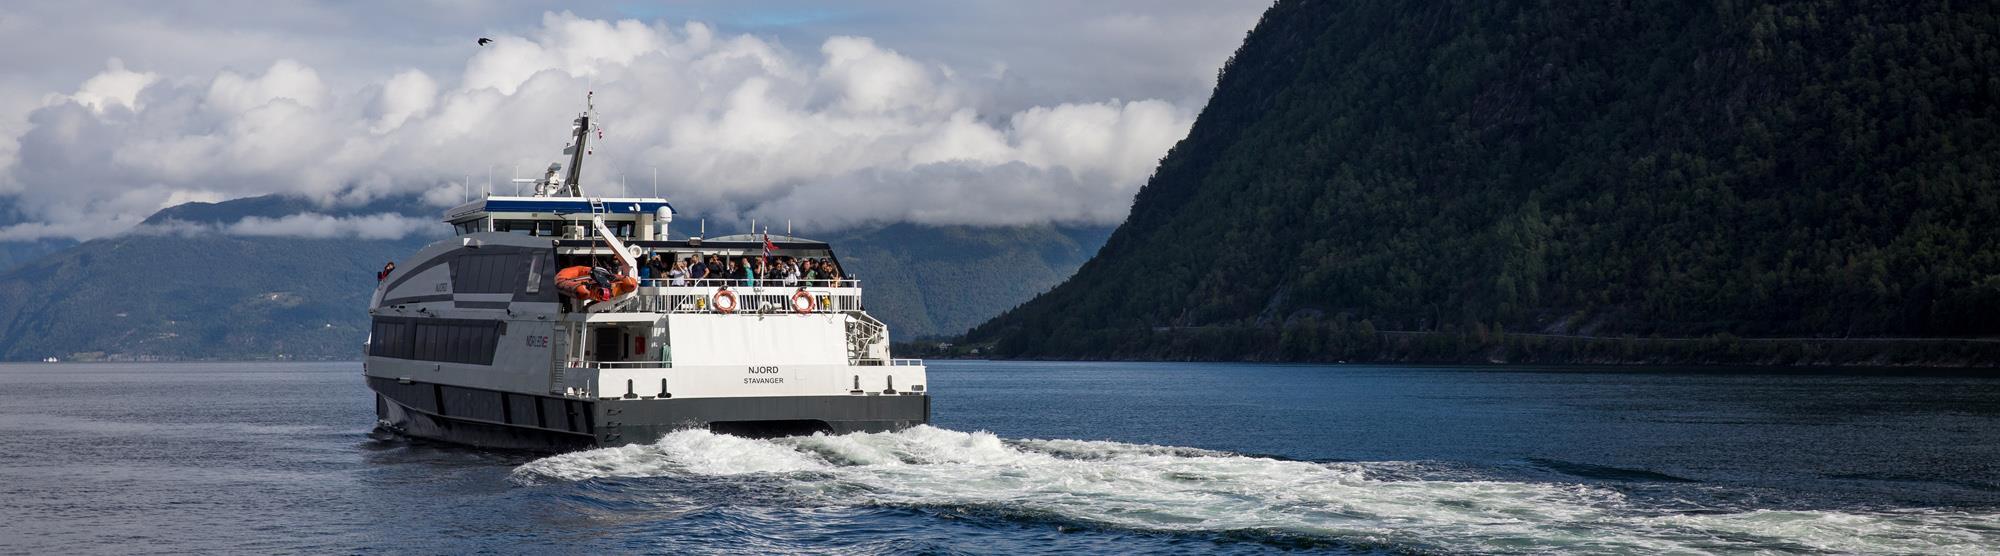 Four popular tours from Bergen